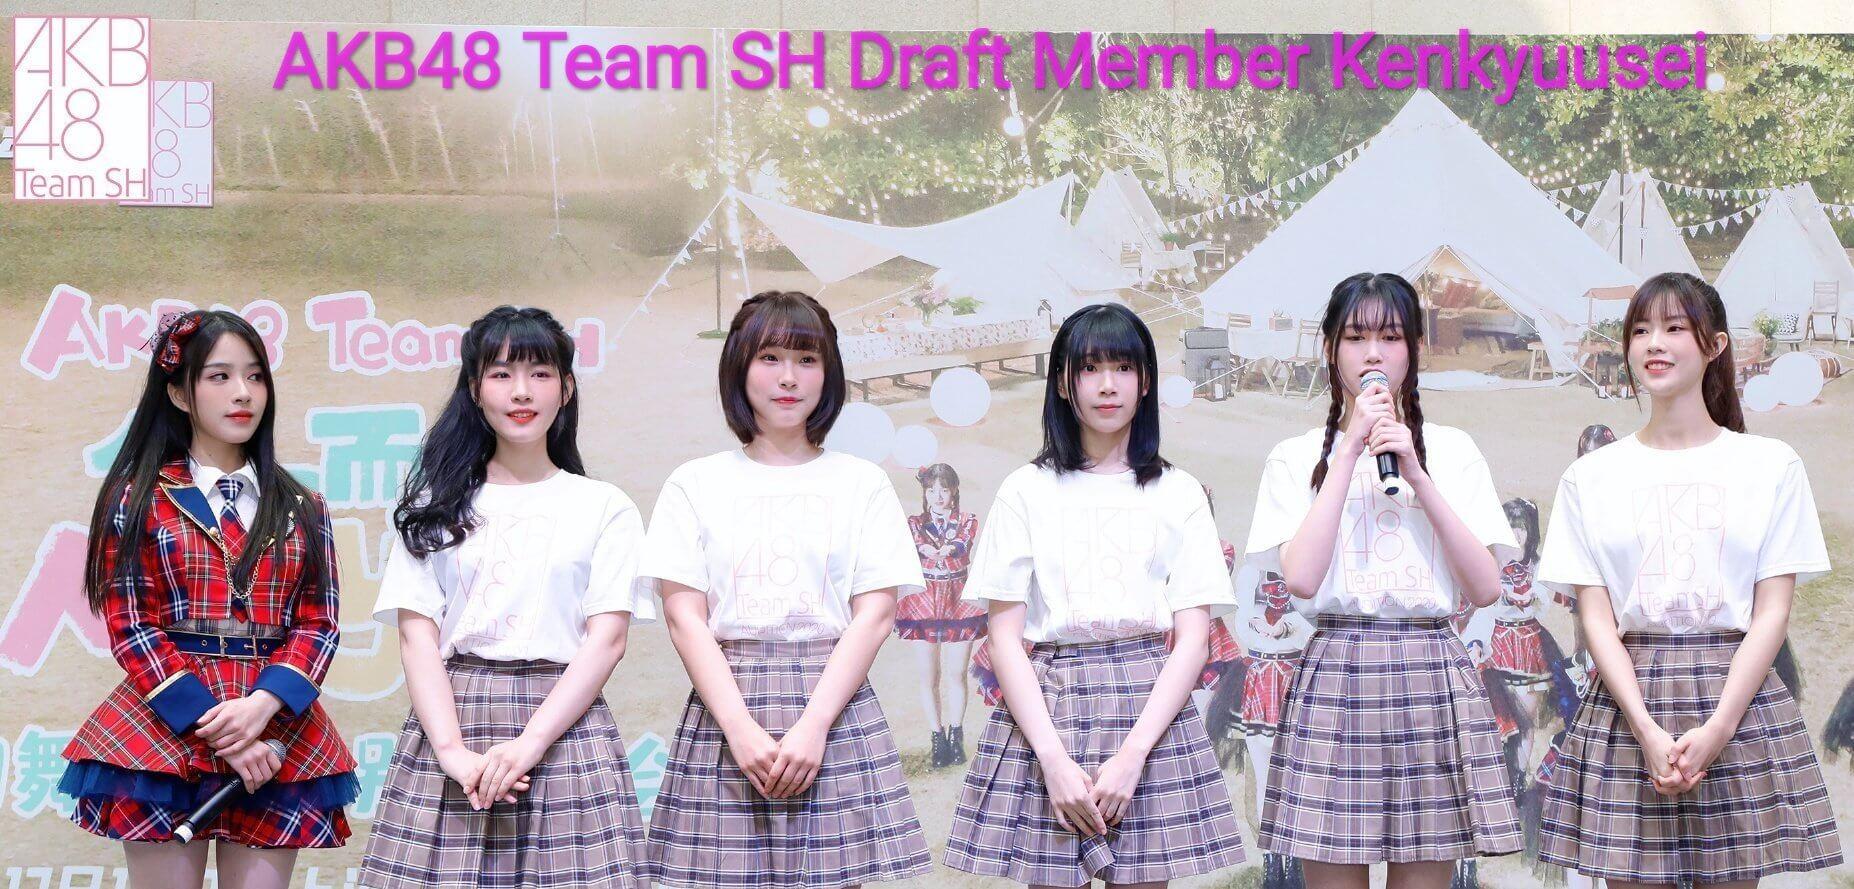 Draft Member AKB48 Team SH